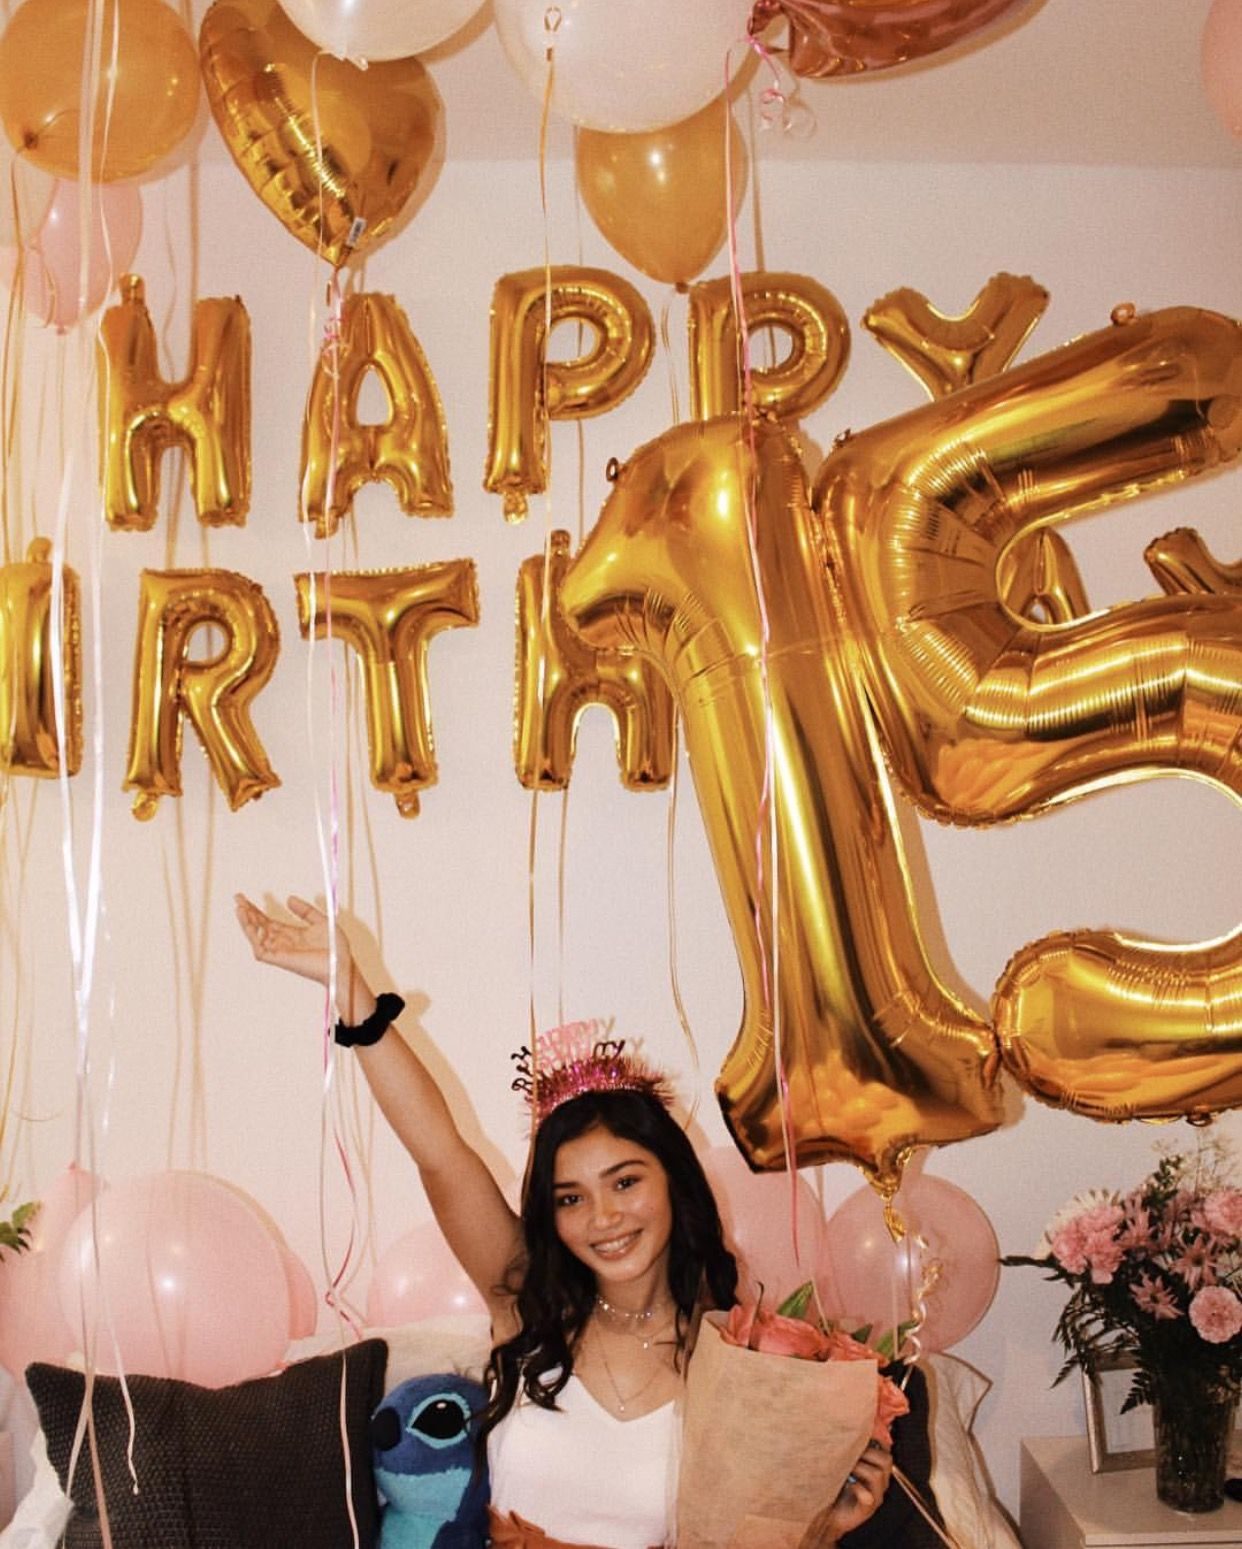 15th Birthday Pinterest Just4girls 15th Birthday Party Ideas 15th Birthday Decorations Happy 15th Birthday